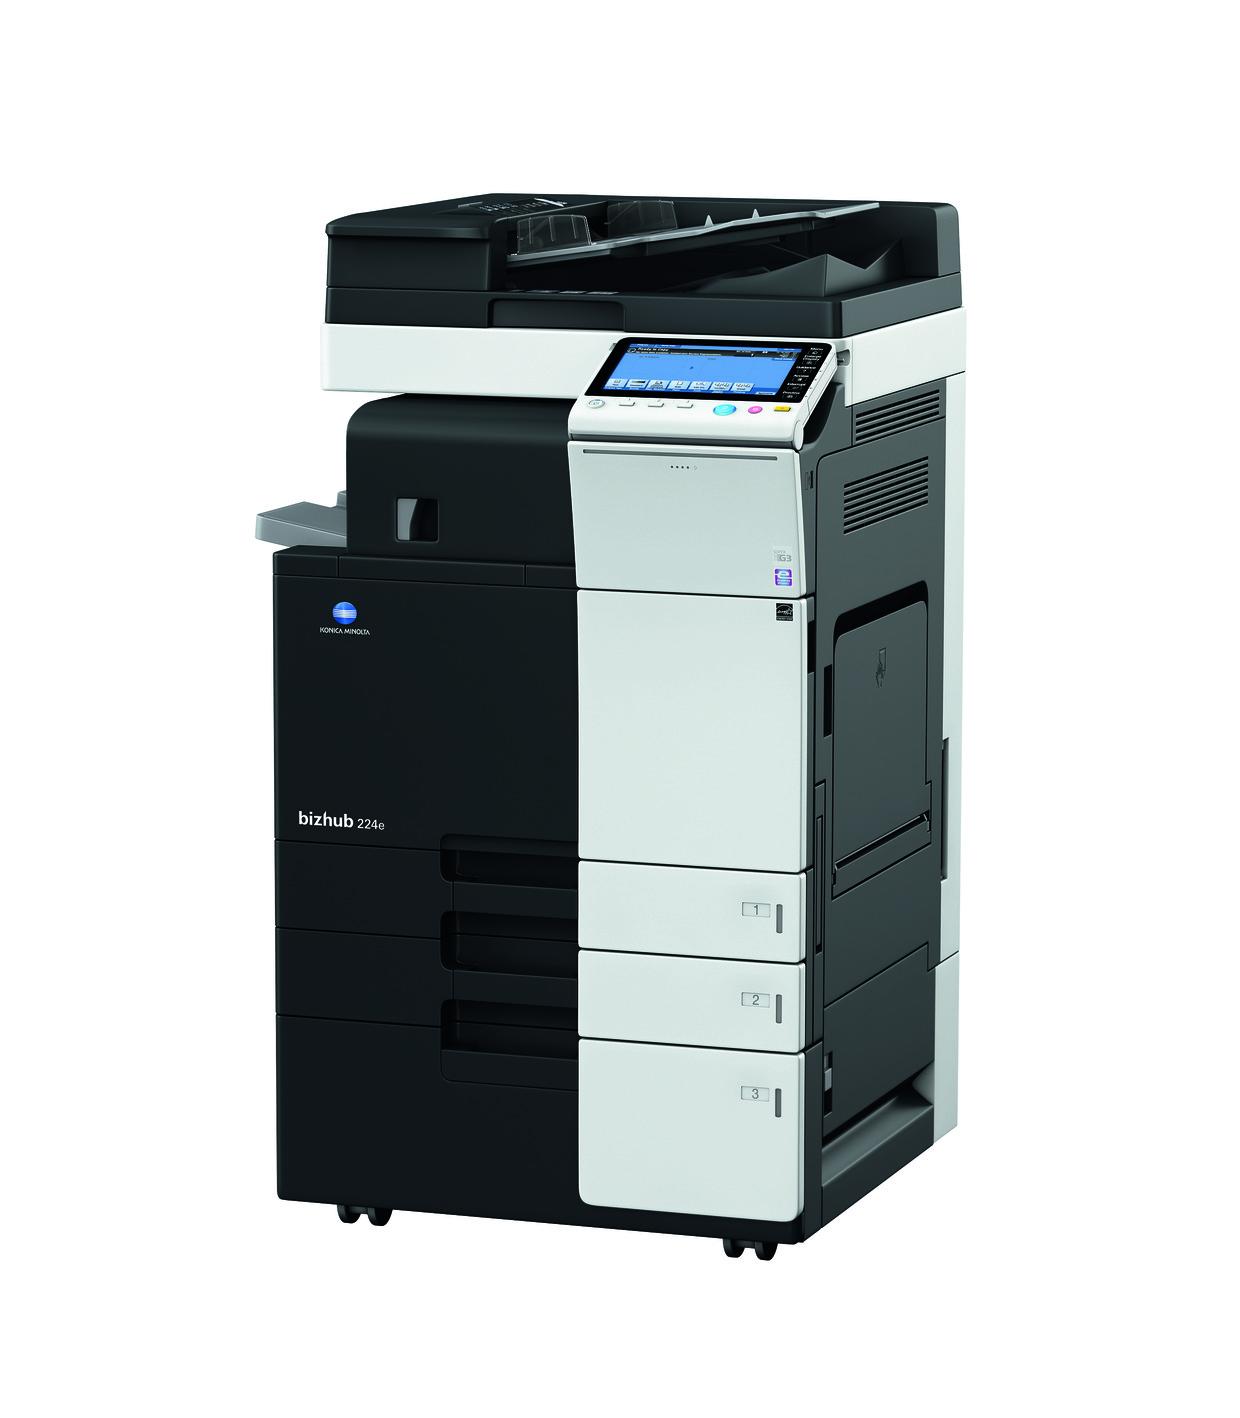 konica minolta bizhub 224e multifunction printer ebm rh ebmltd co uk Bizhub  Konica Minolta Printer Dimensions Bizhub Konica Minolta Printer Dimensions